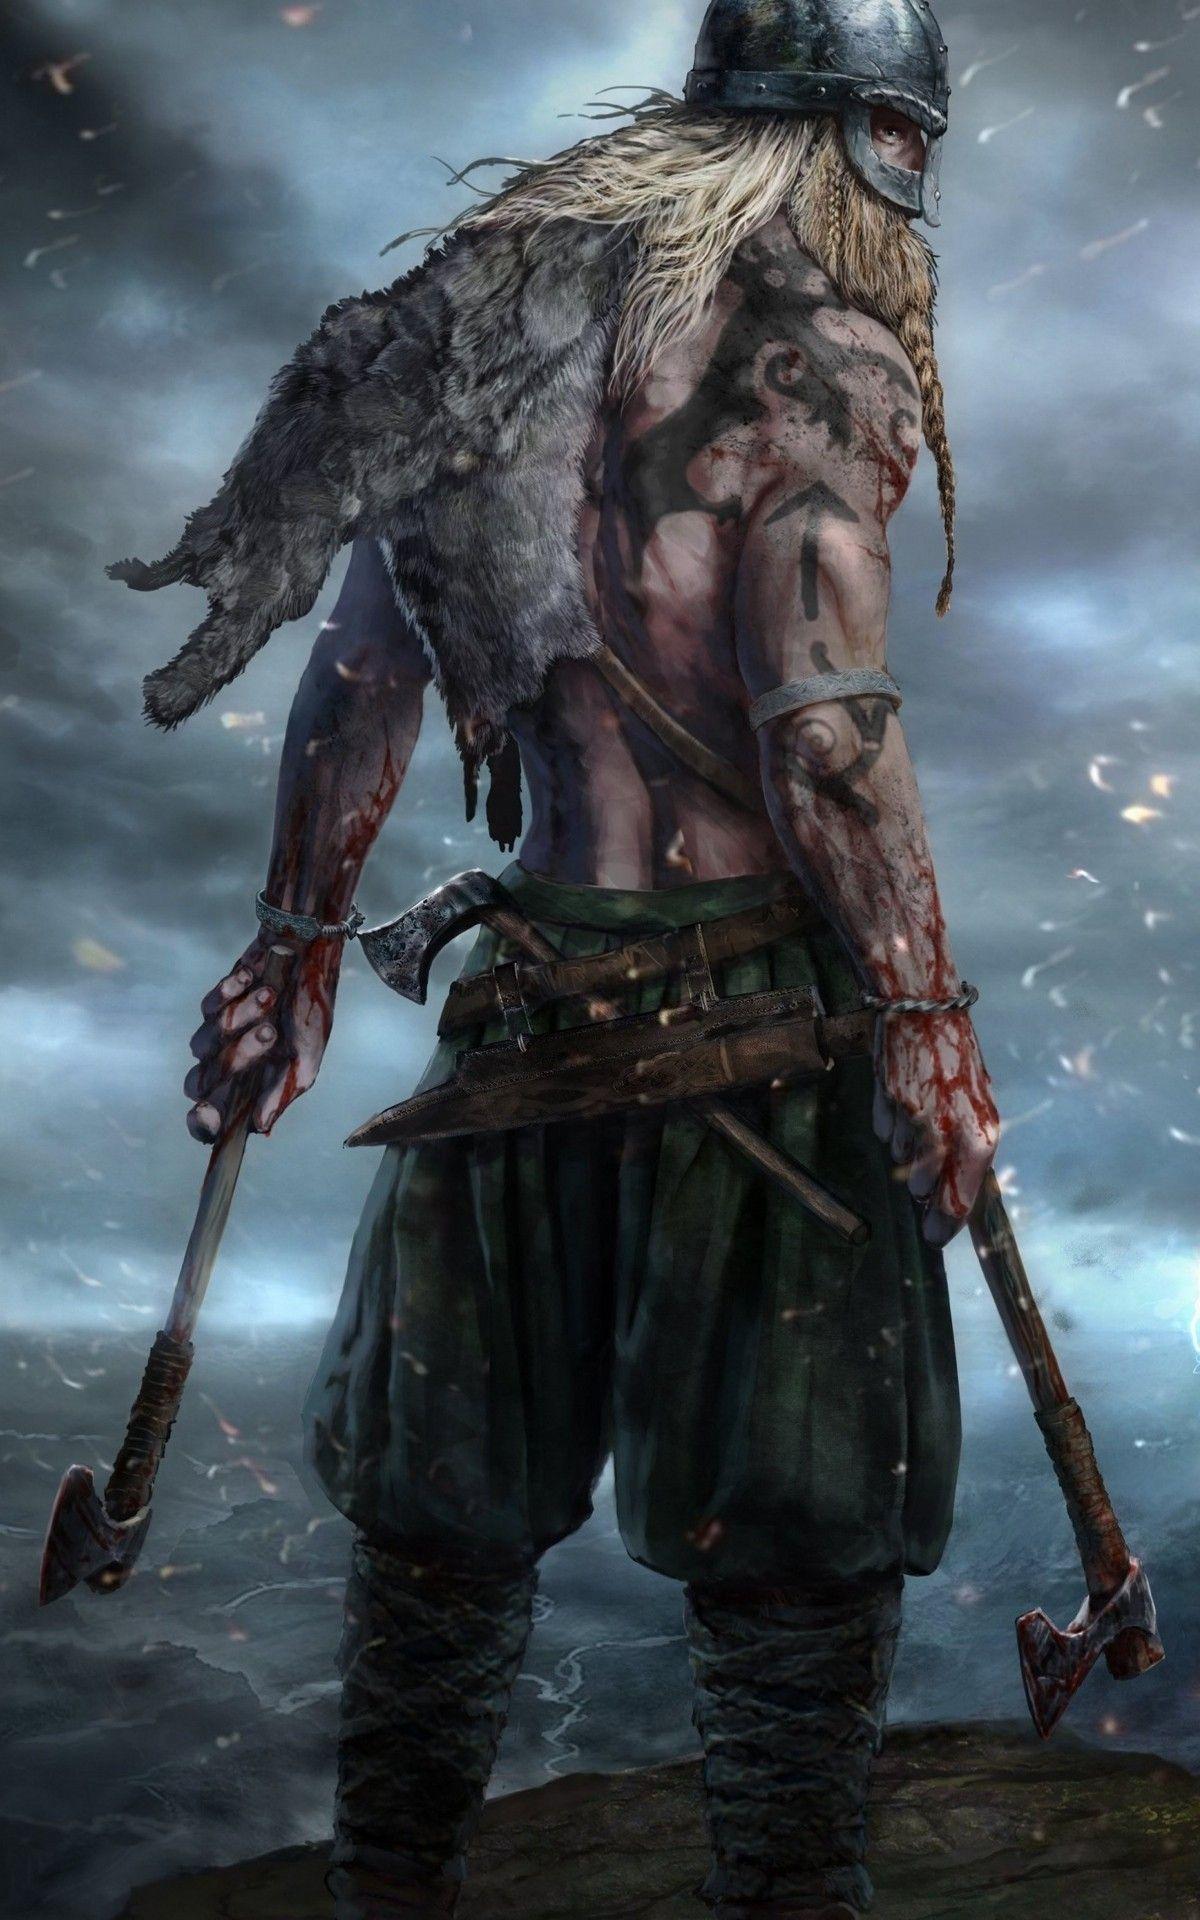 Shirtless Men Of Fantasy Barbarian Fighter Barbarian